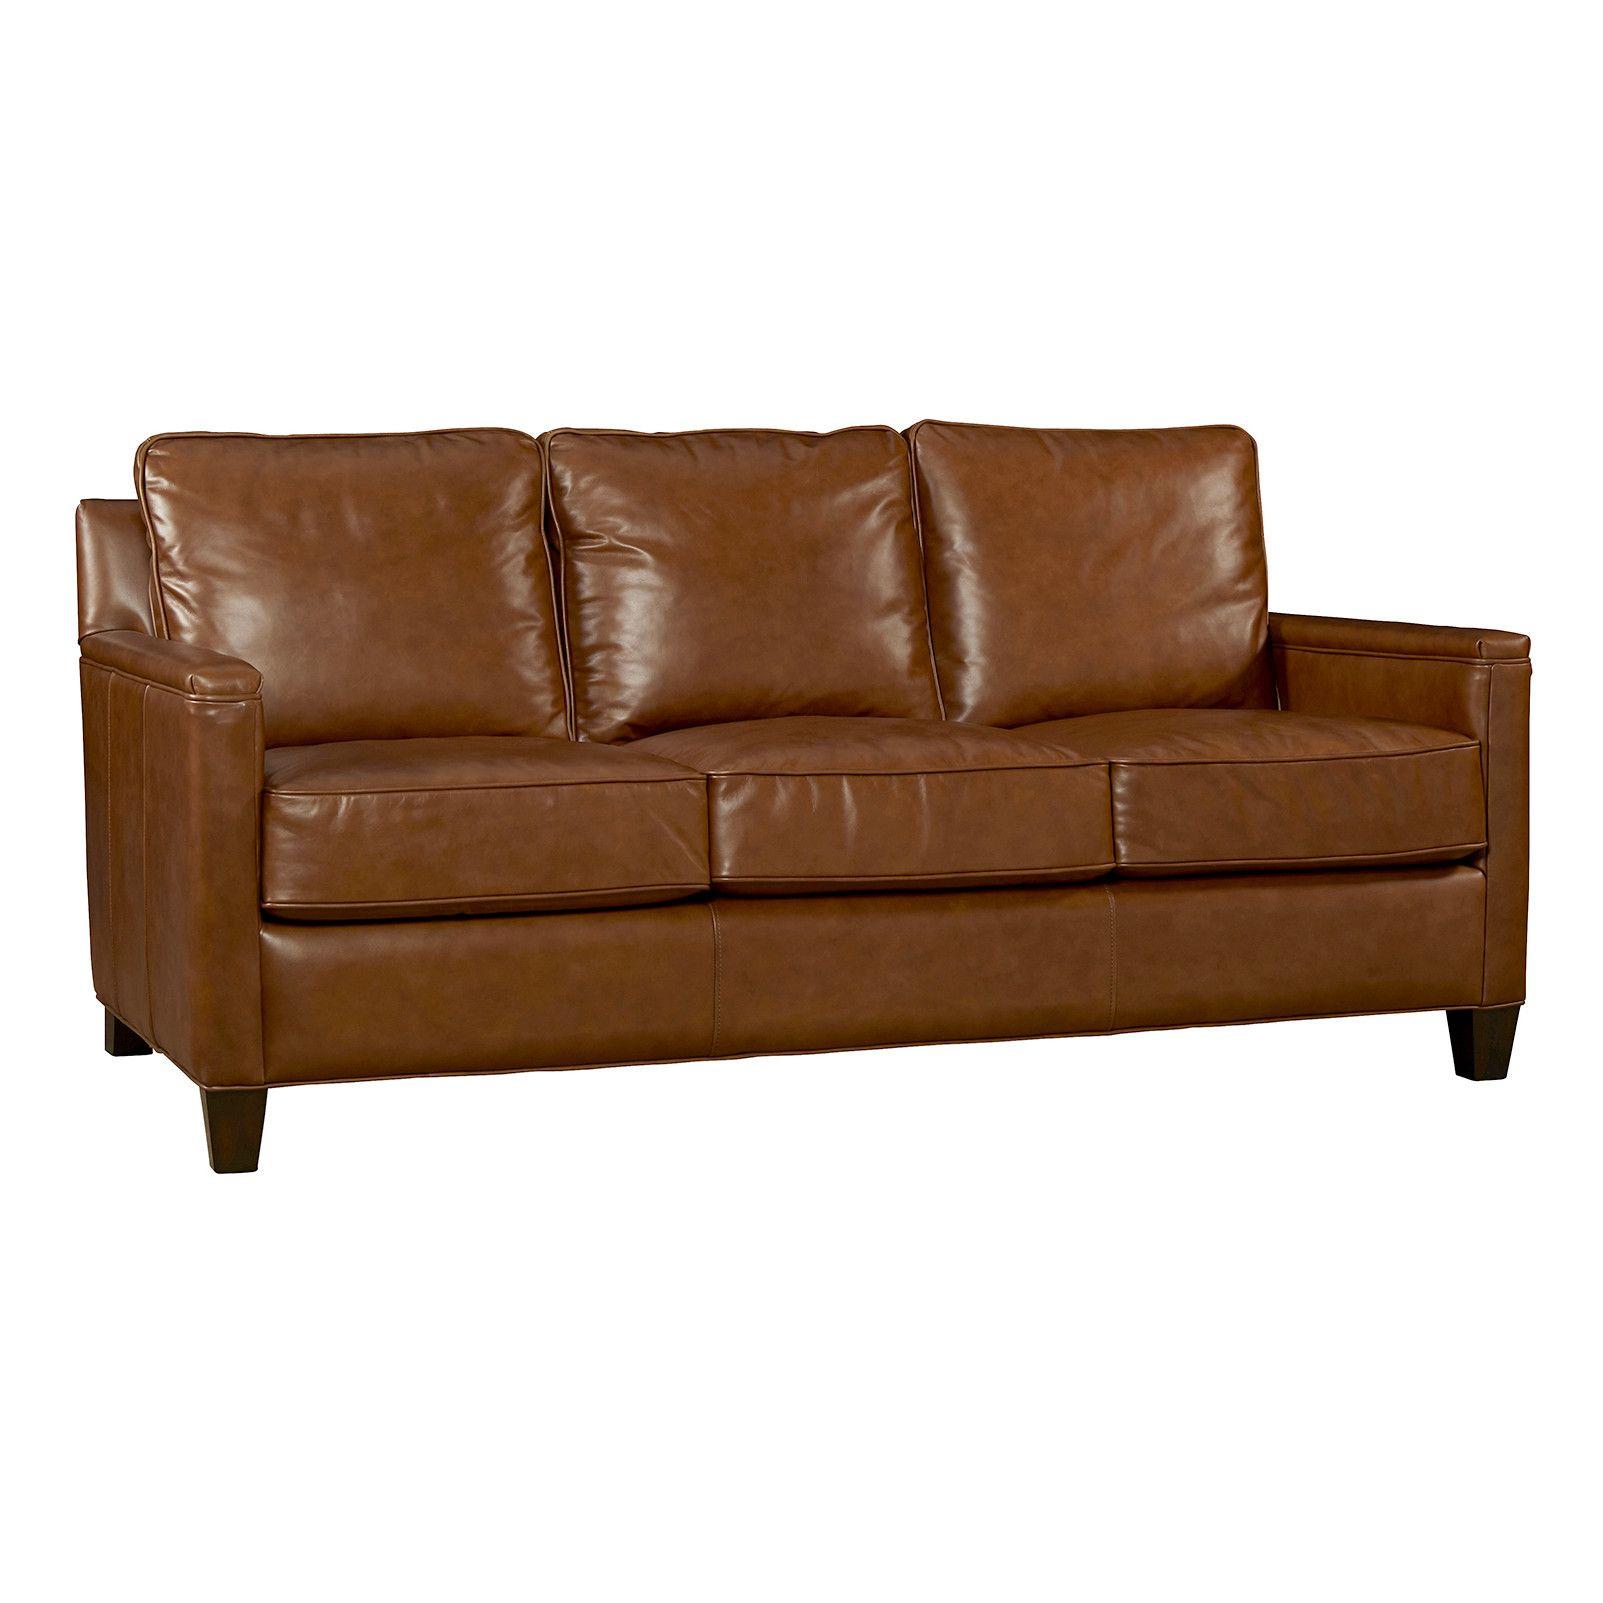 Palatial Furniture Alexander Leather Sofa